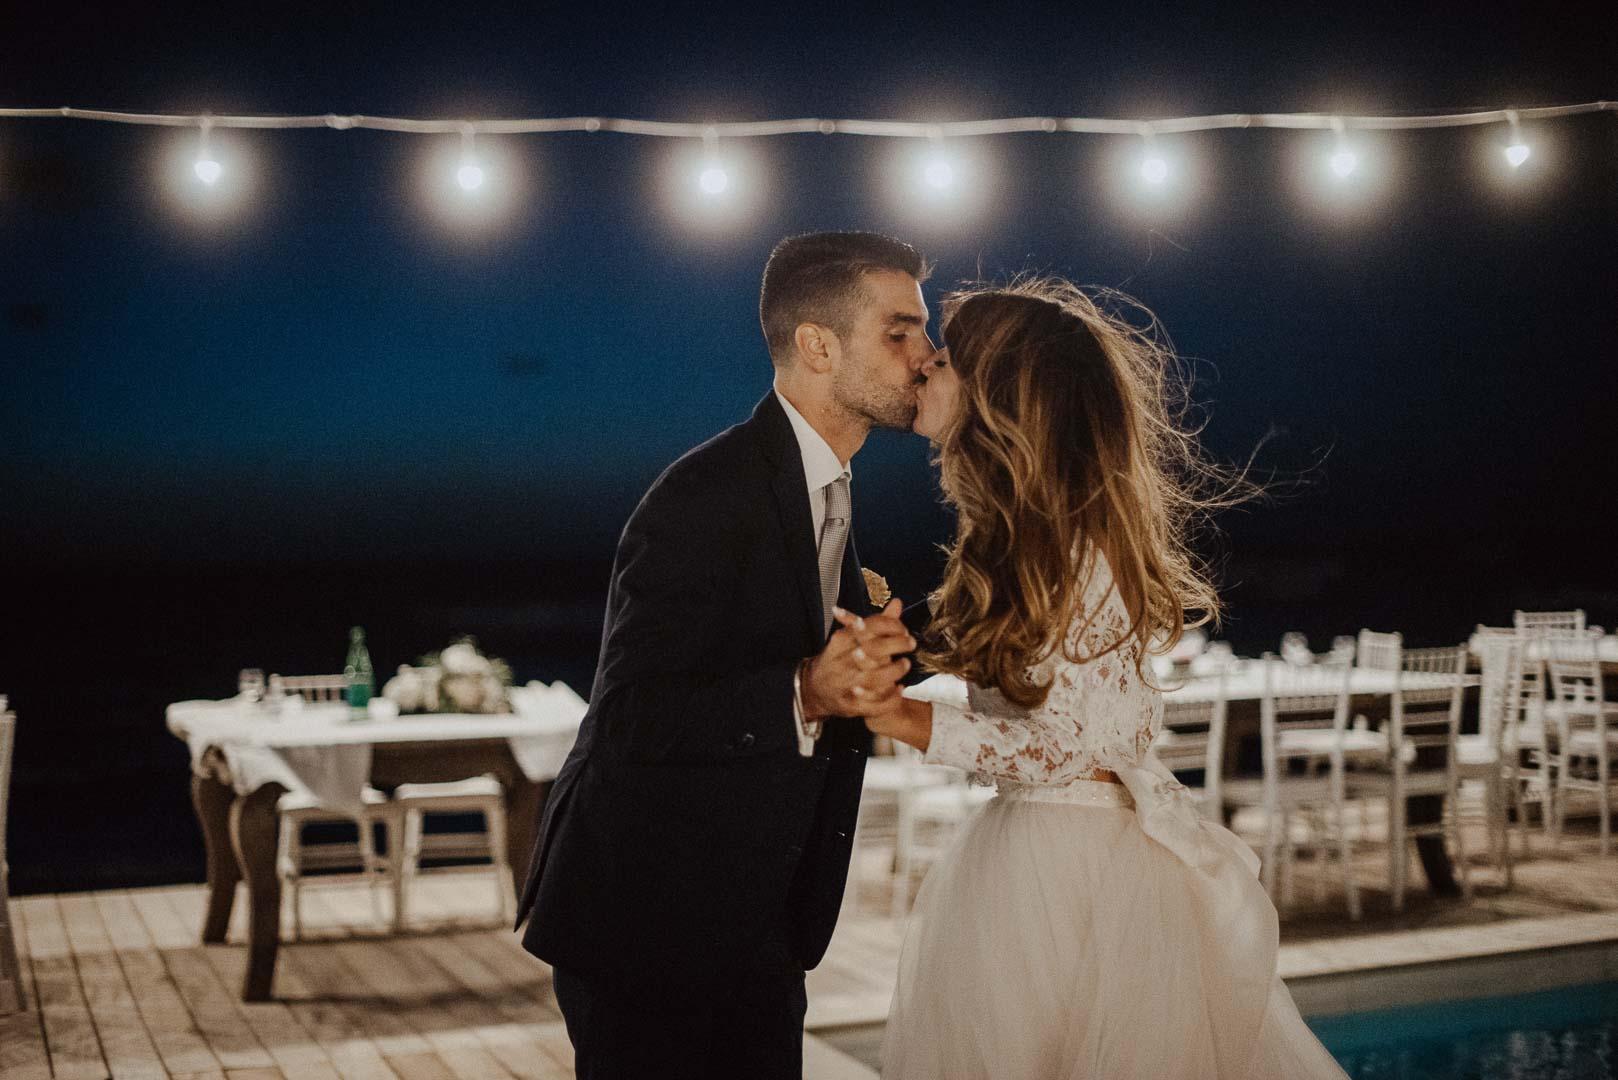 wedding-photographer-destination-fineart-bespoke-reportage-napoli-nabilah-vivianeizzo-spazio46-162